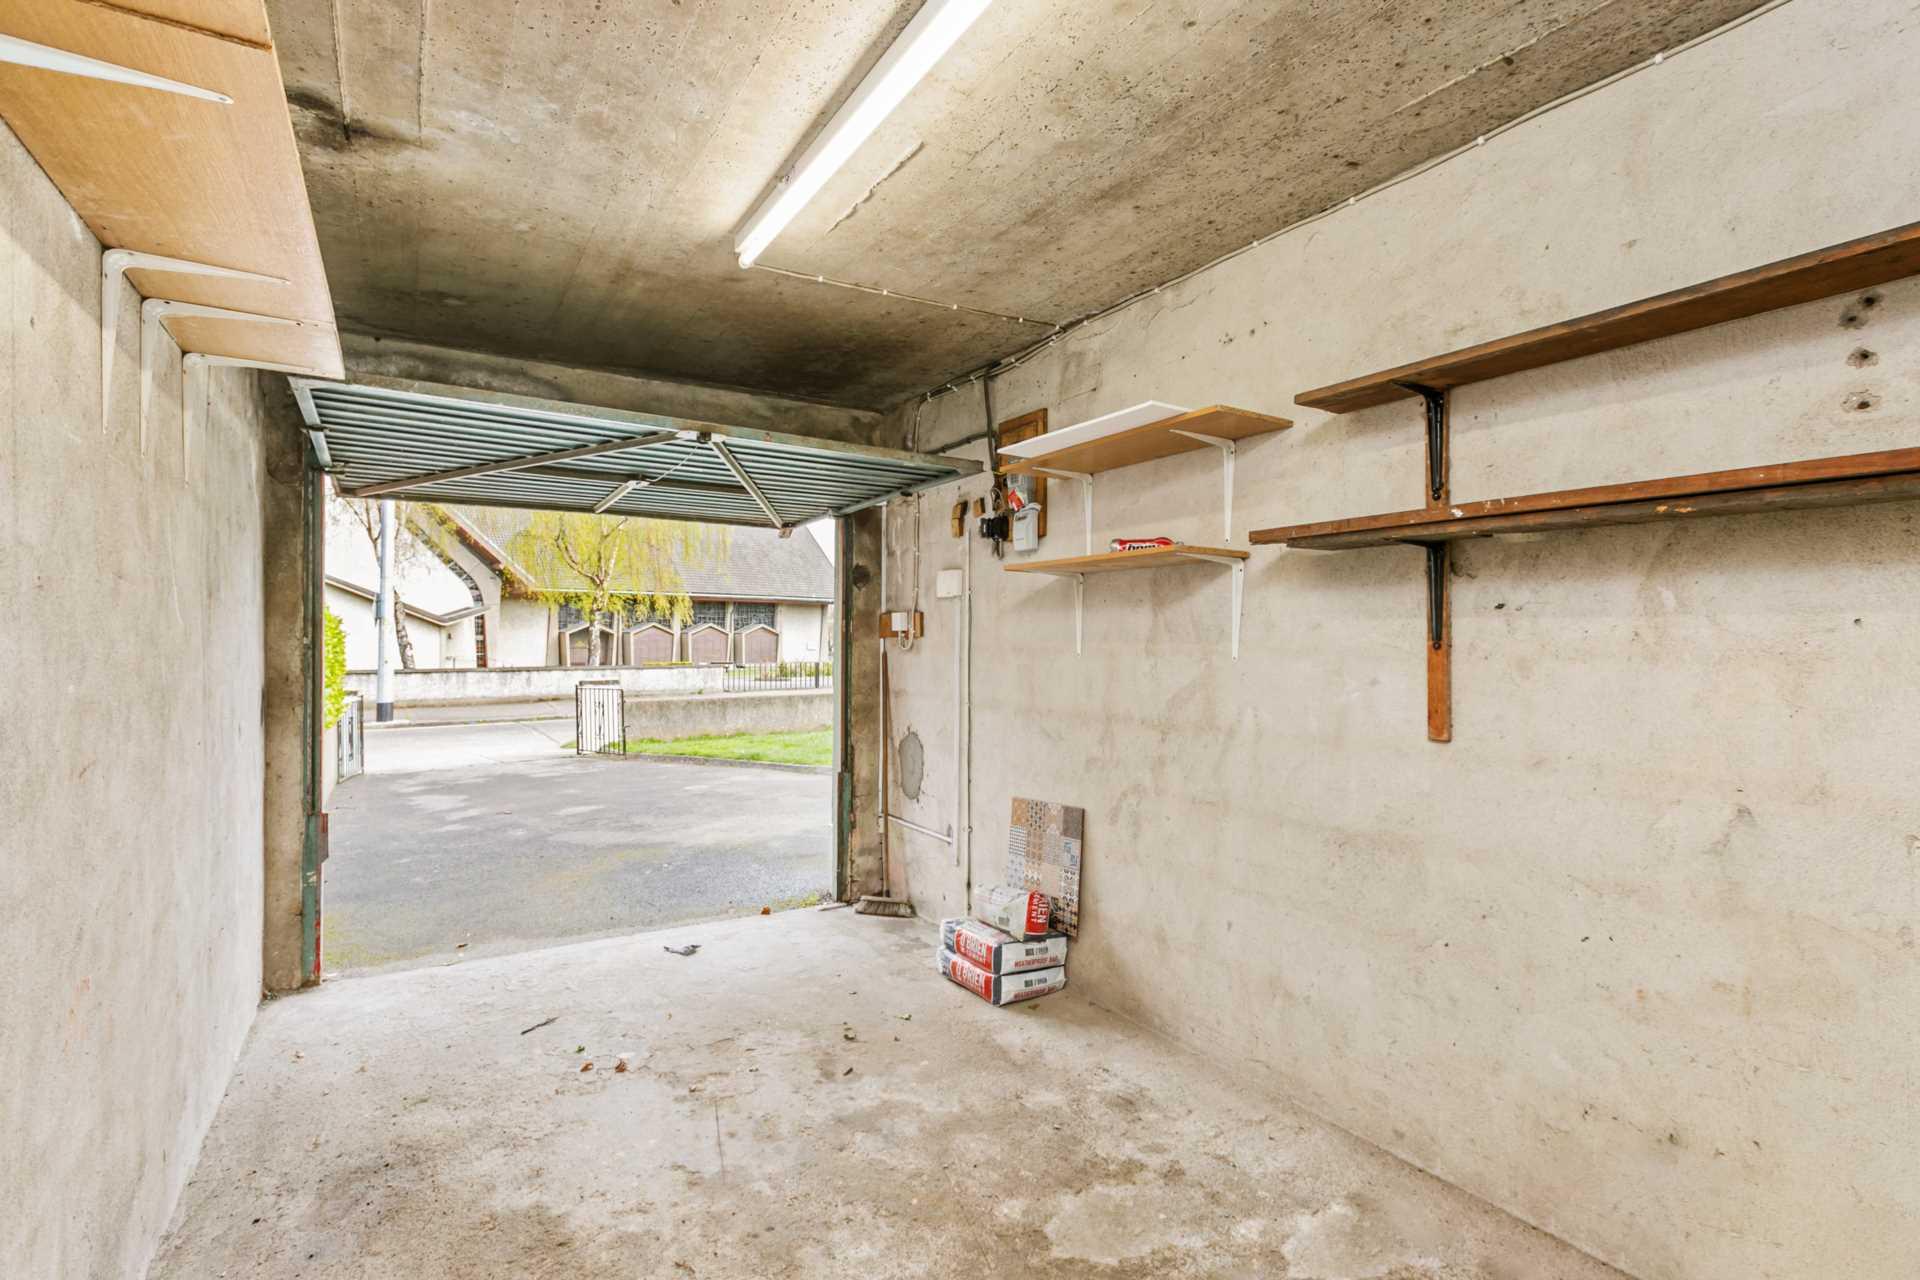 67 Anne Devlin Park, Rathfarnham, Dublin 14, Image 12